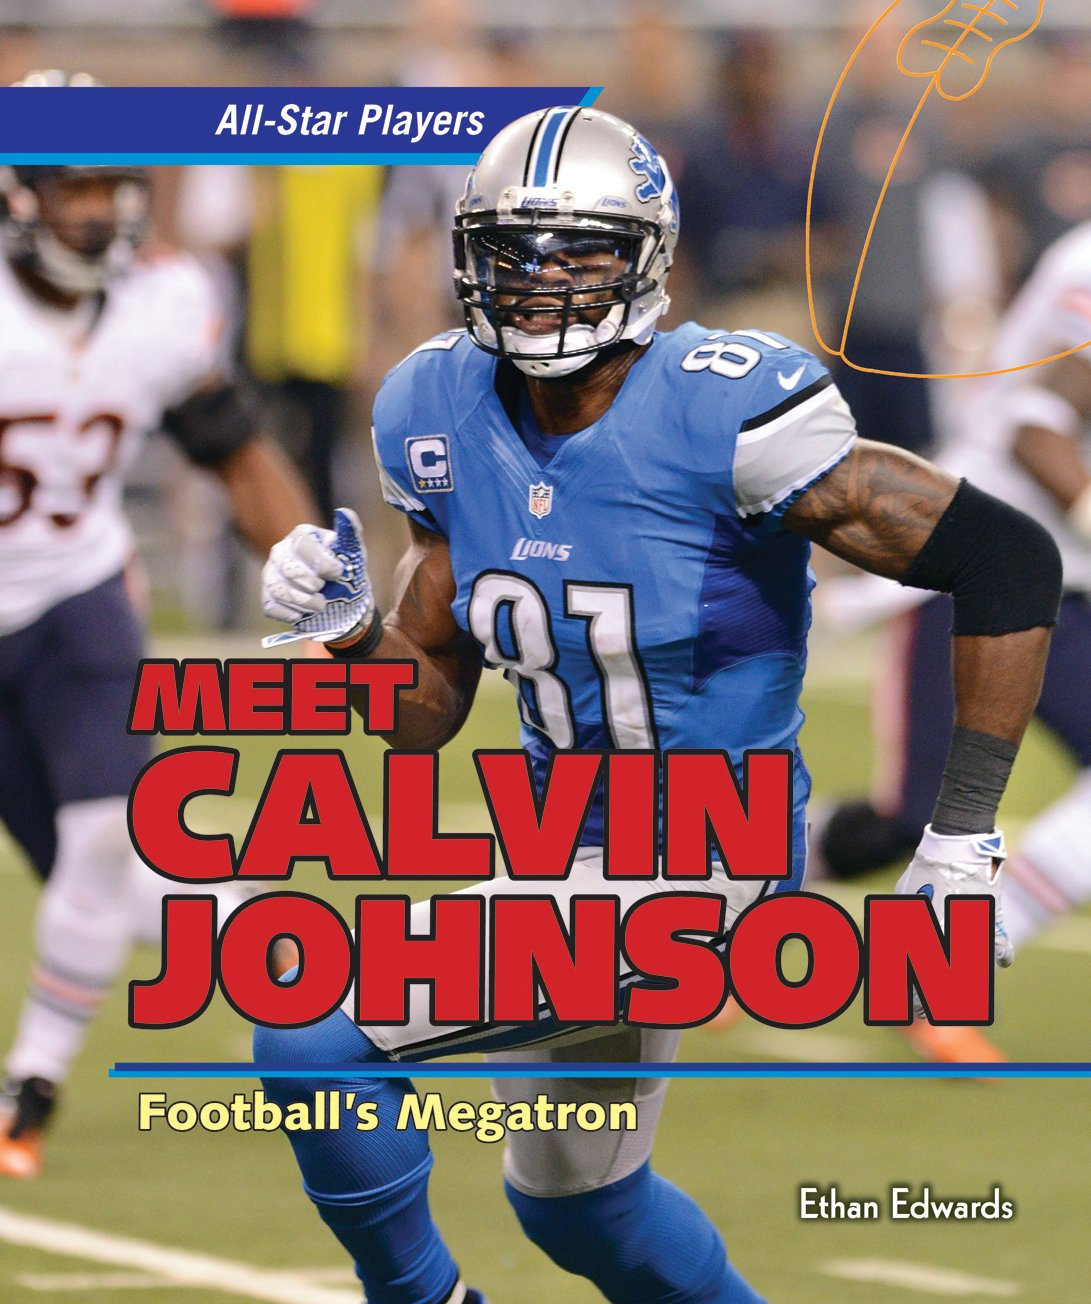 Meet Calvin Johnson: Football's Megatron (All-Star Players)